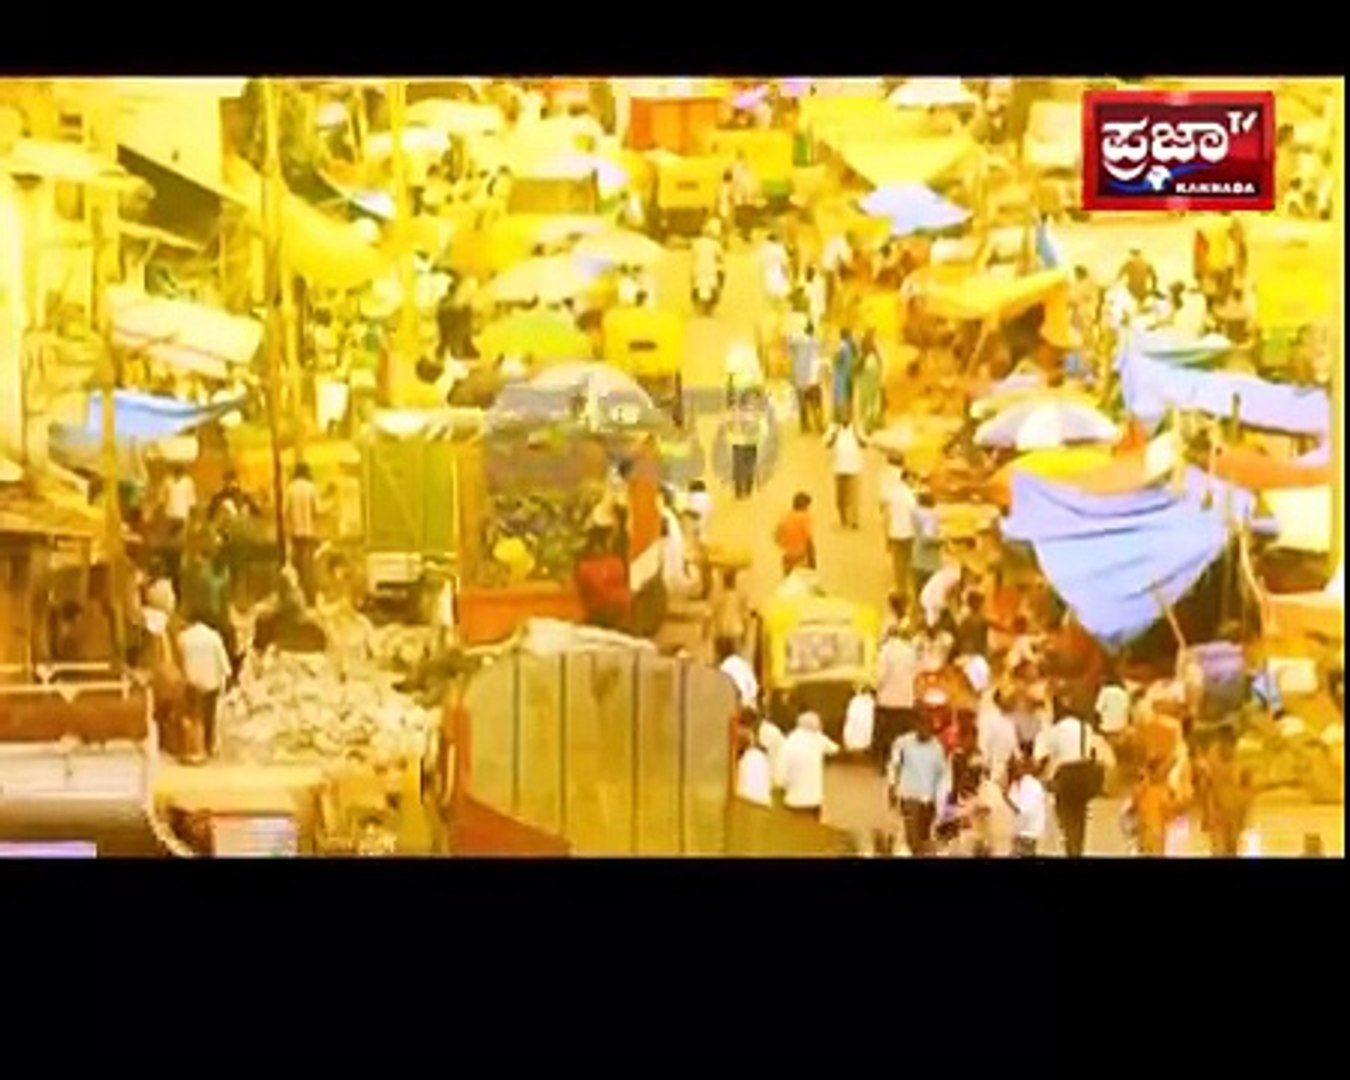 Prajaa TV Dead End Oct 24 Market Mafia Rowdy Sunila story